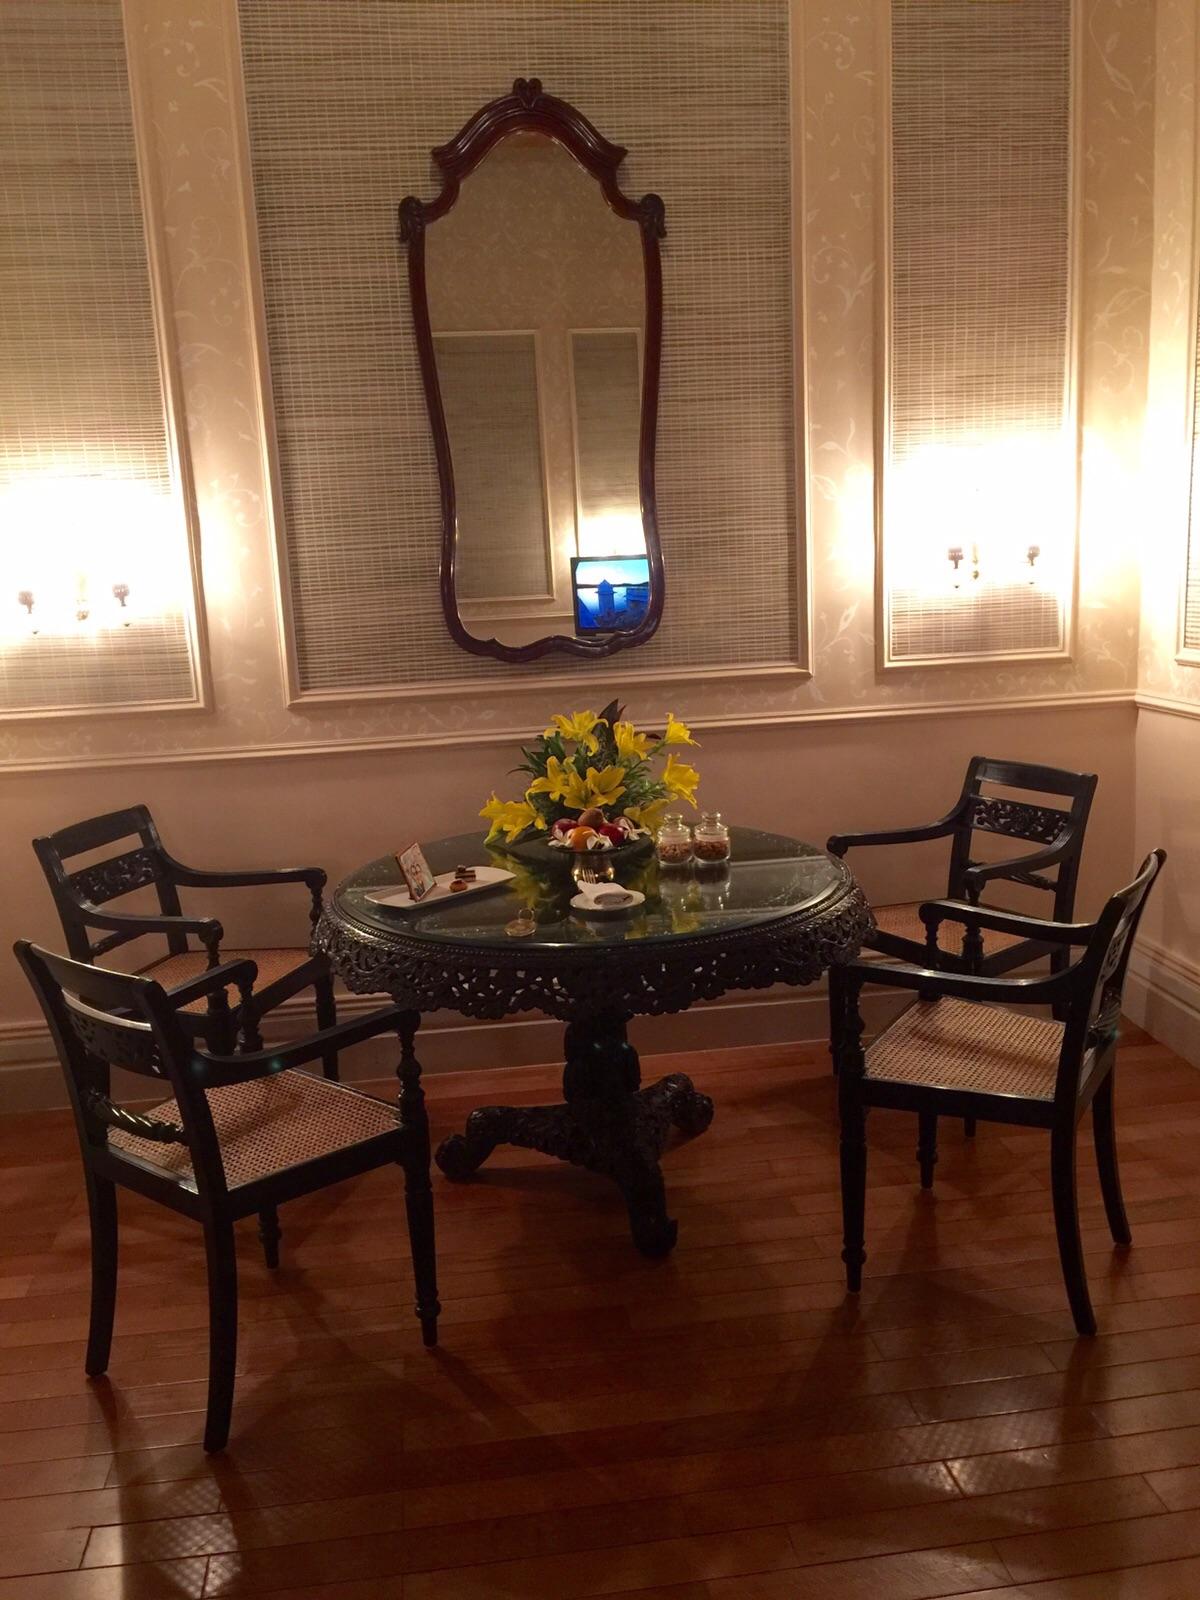 taj falakuma dining table, luxury hotel Hyderabad, luxury palace hyderabad, Taj Falaknuma Palace Hyderabad, taj hotel hyderabad,